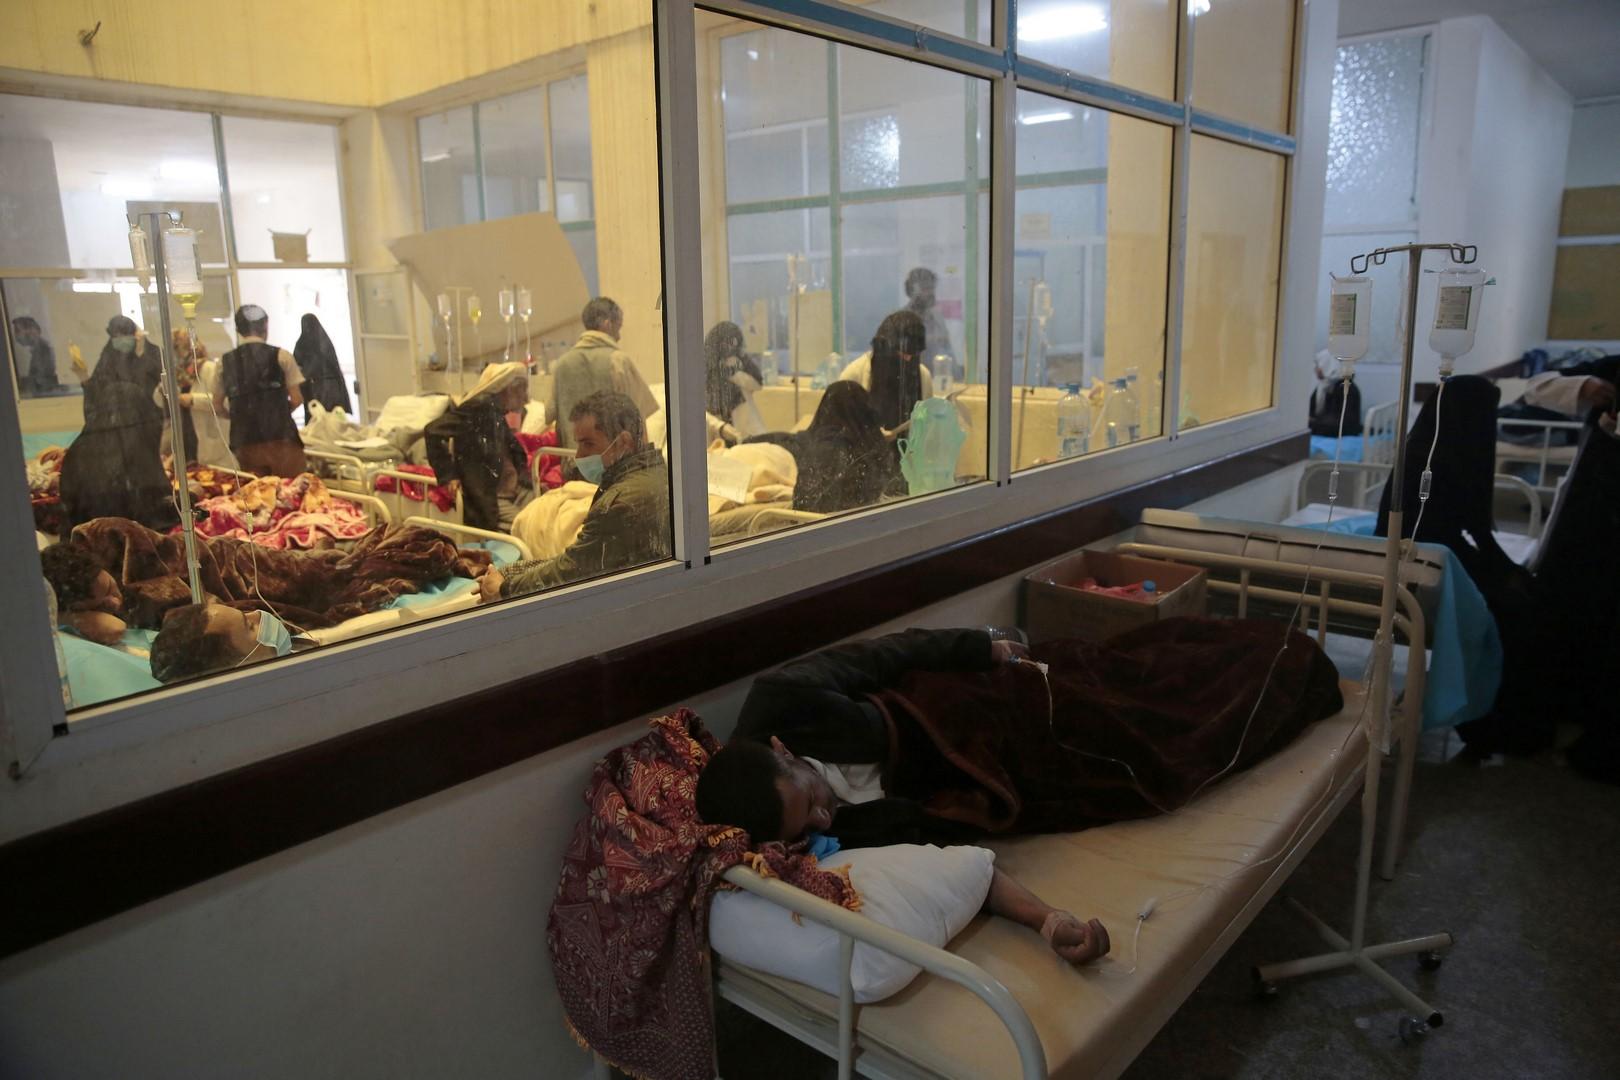 https://i2.wp.com/noticieros.televisa.com/wp-content/uploads/2017/06/aumentan-a-570-los-muertos-por-epidemia-de-colera-en-yemenap.jpg